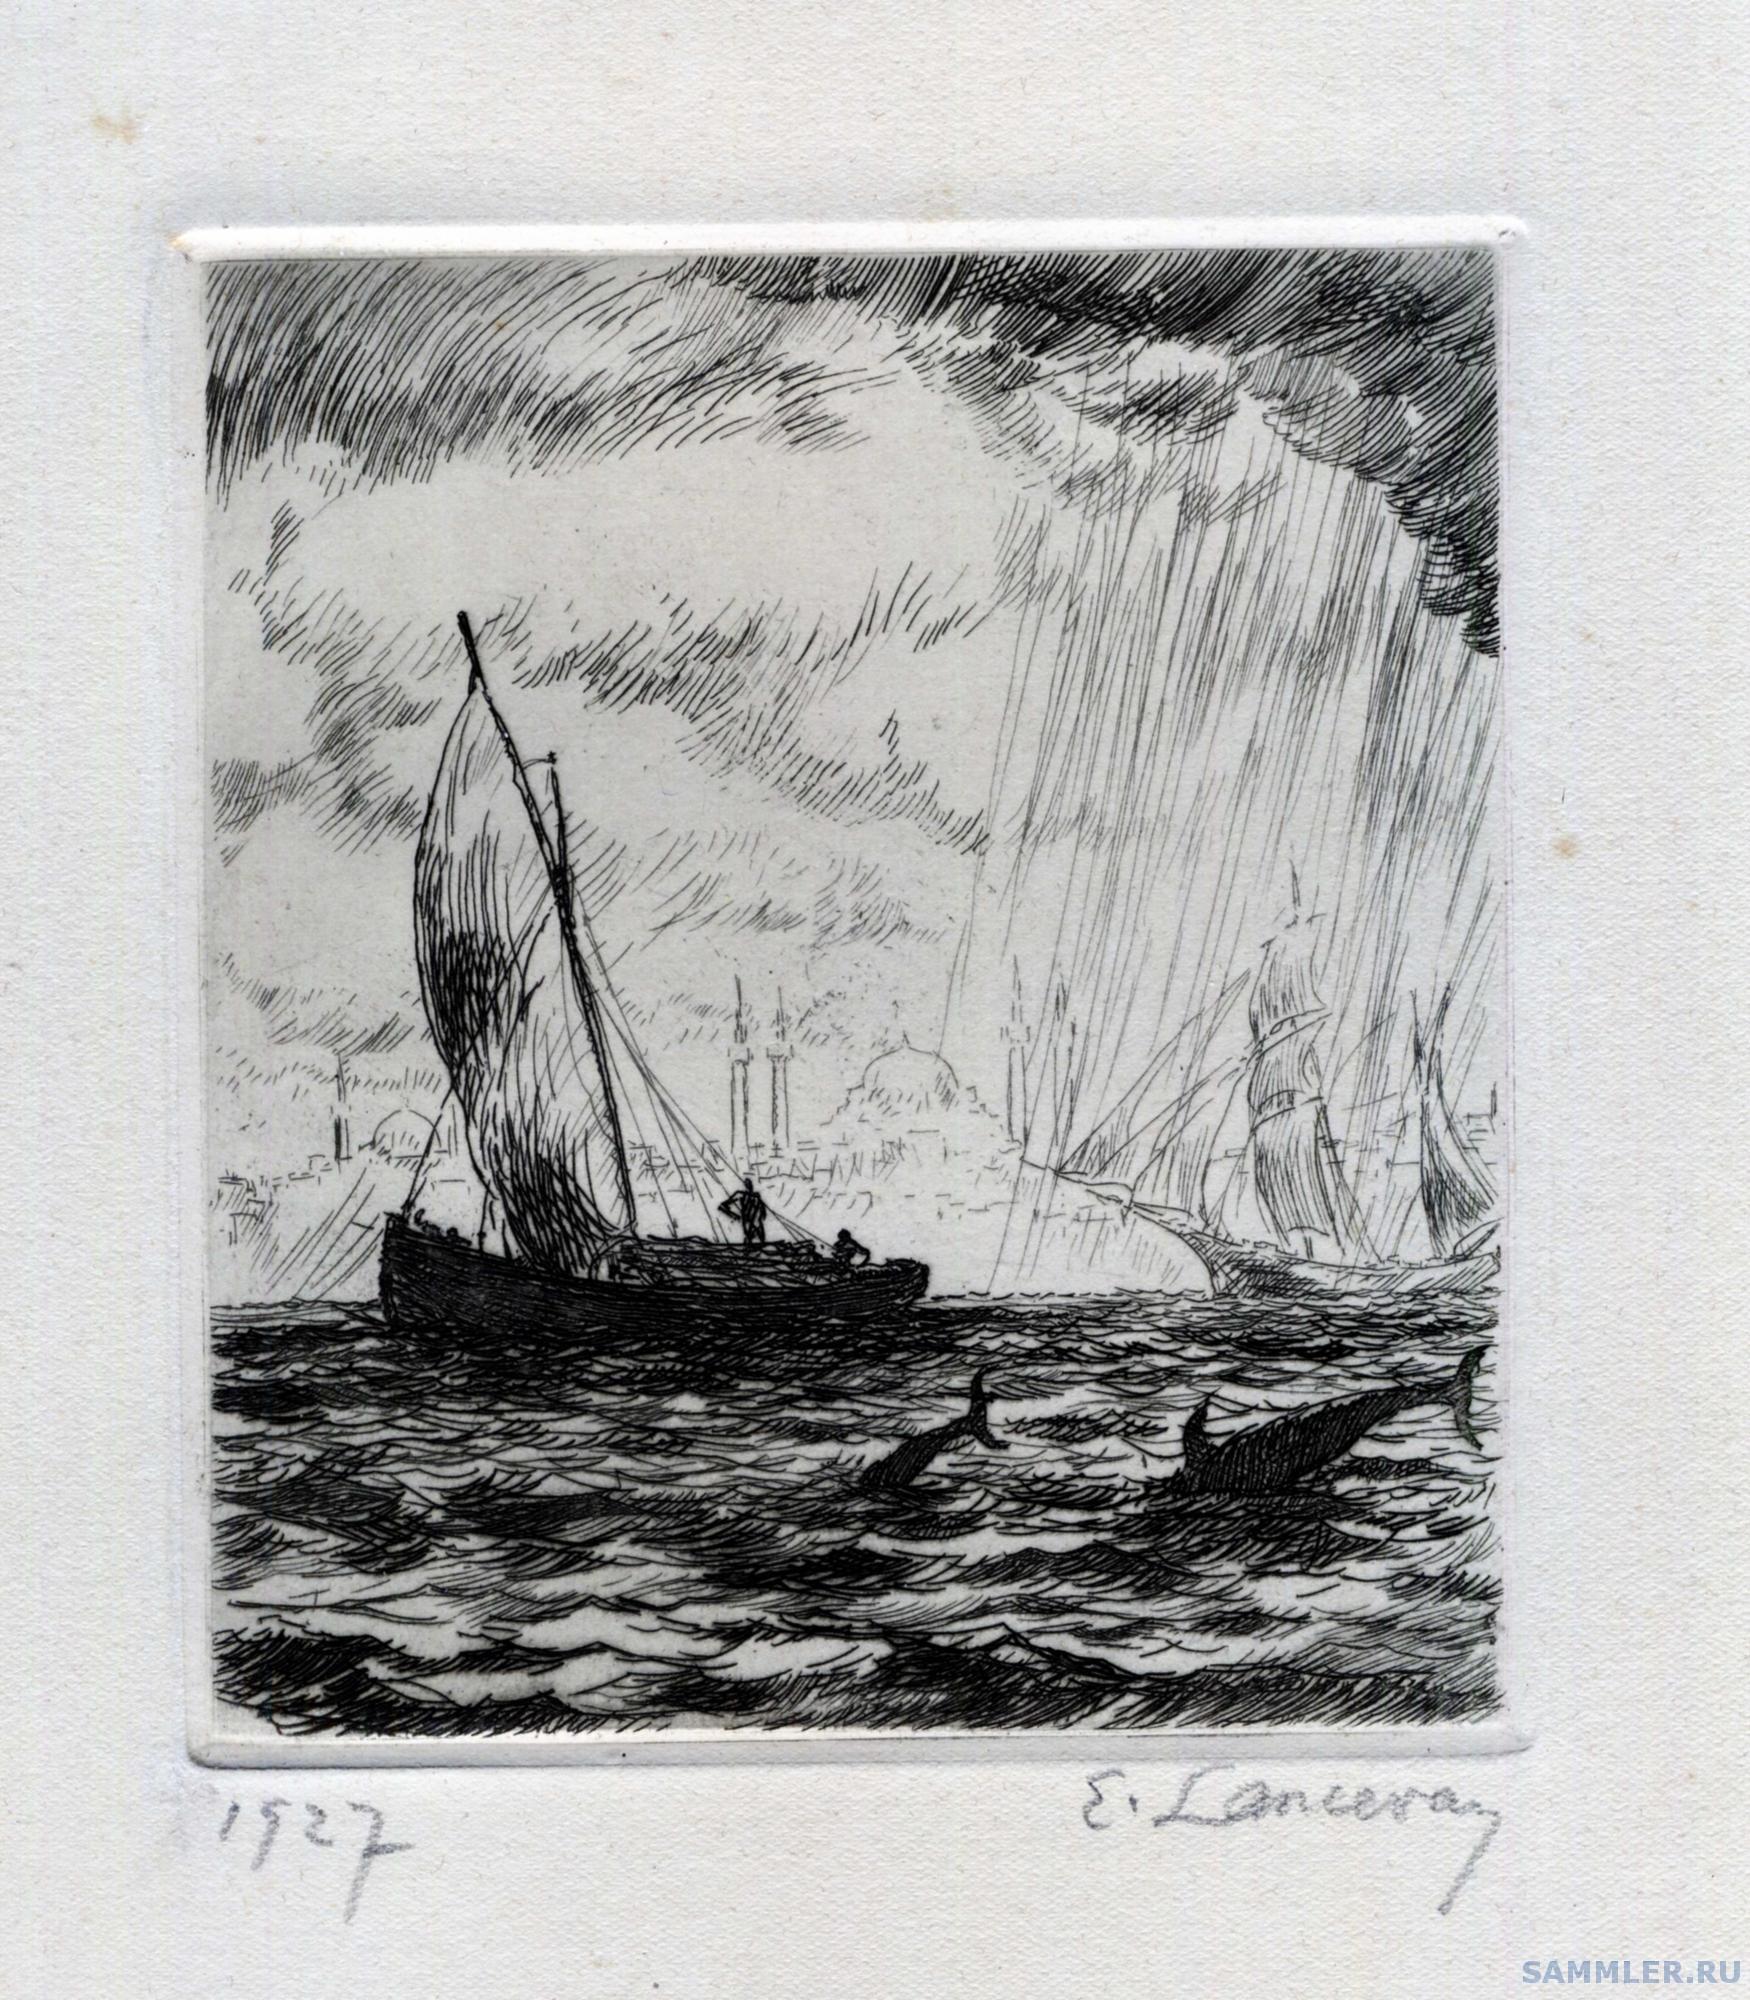 1927 Лансере 02a.jpg